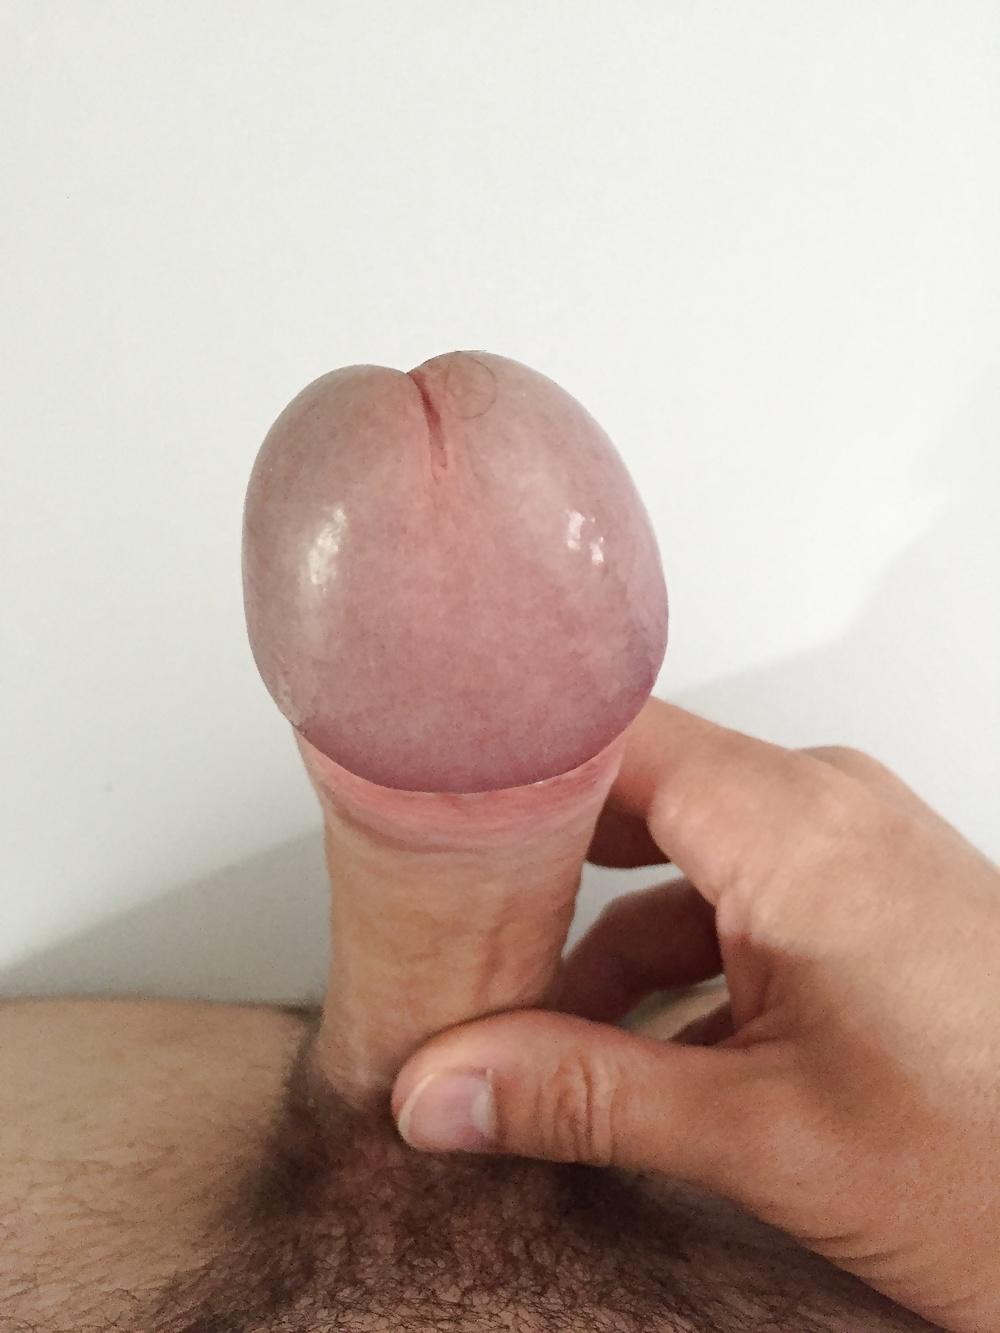 gay porn star arrested jail